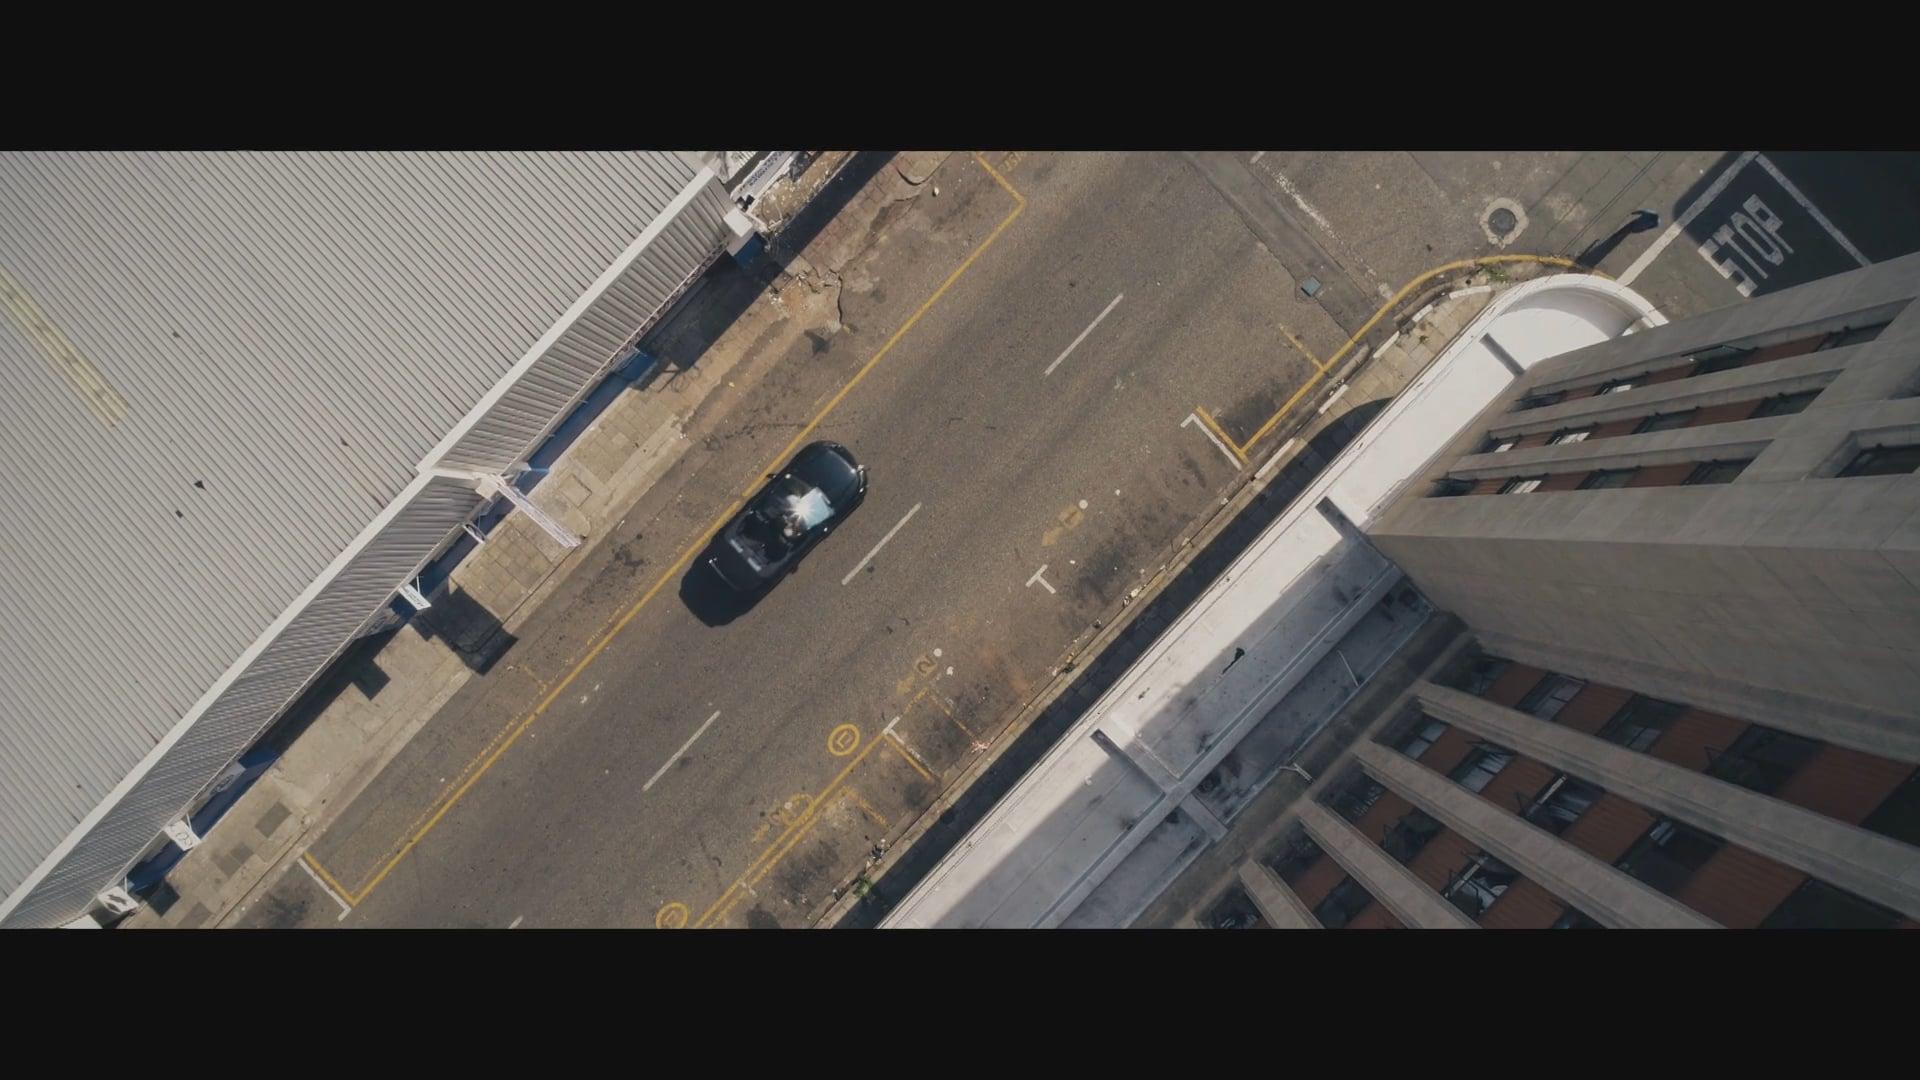 City Evoquation with Tumi Voster & Range Rover Evoque